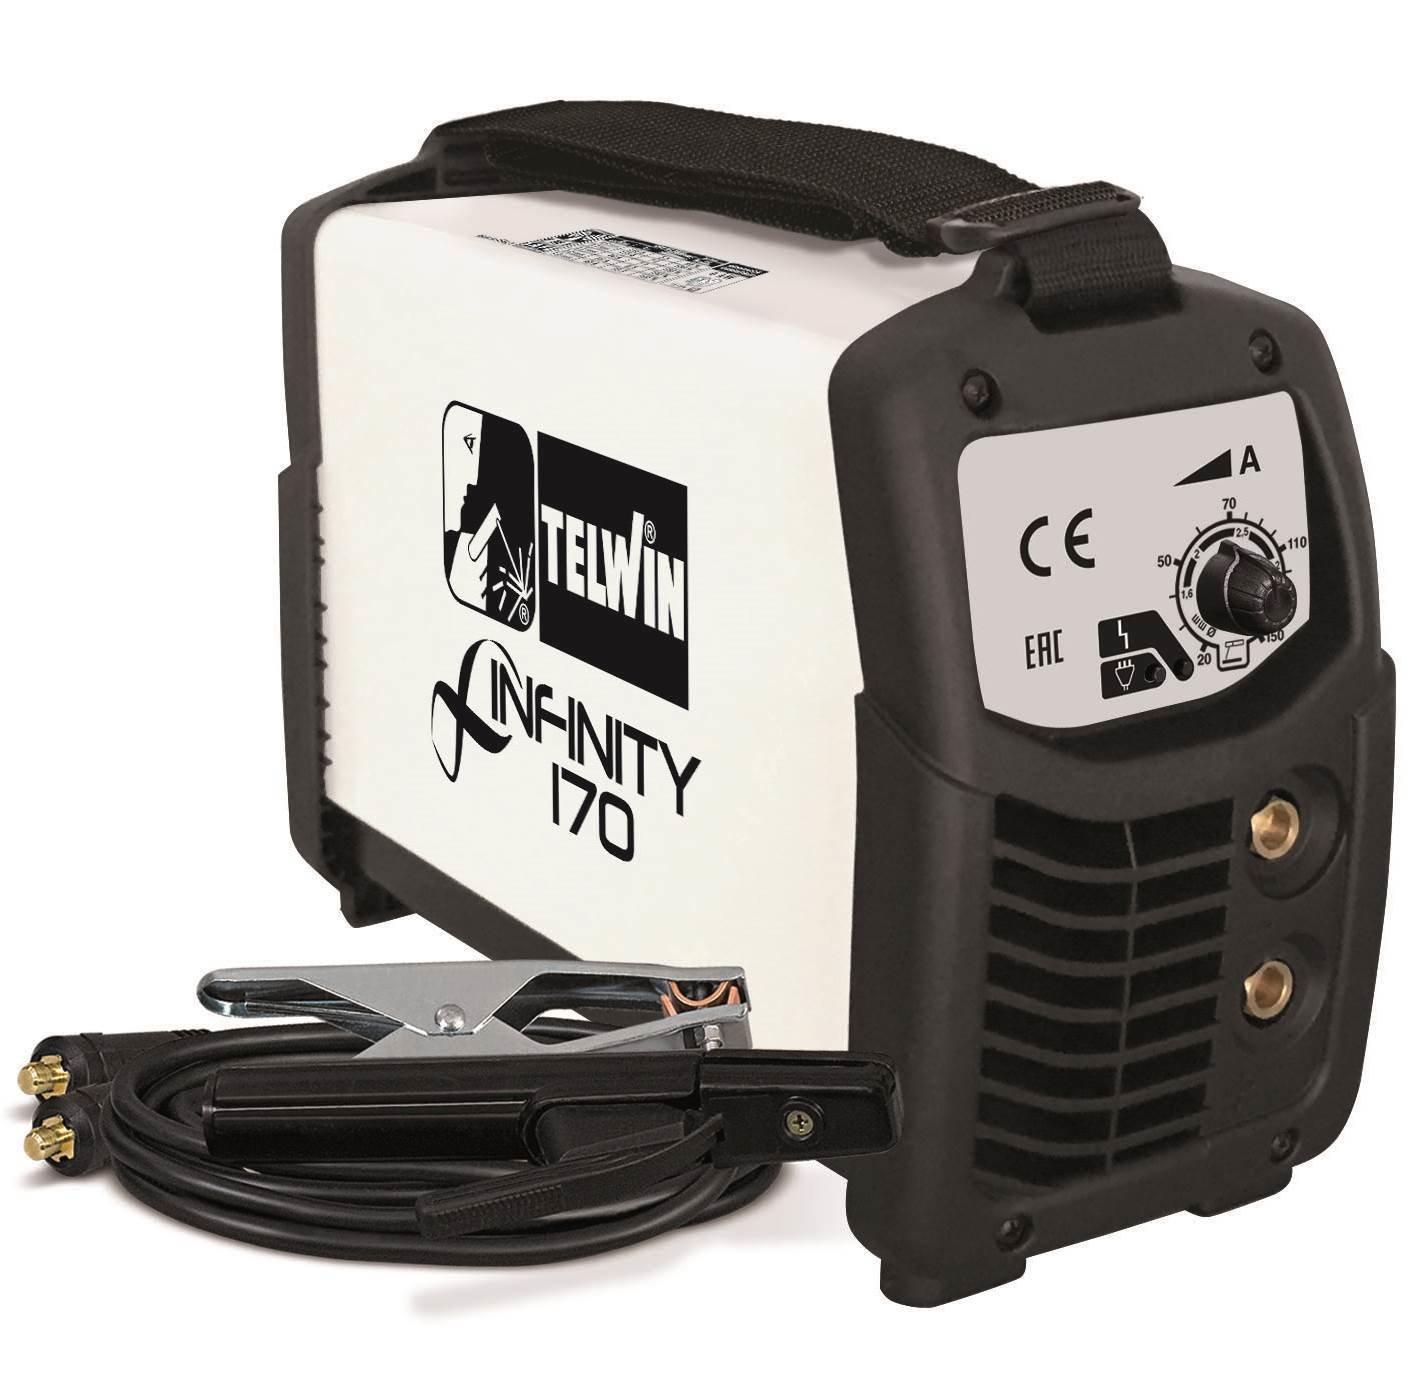 Сварочный аппарат Telwin INFINITY 170 ACX 816080